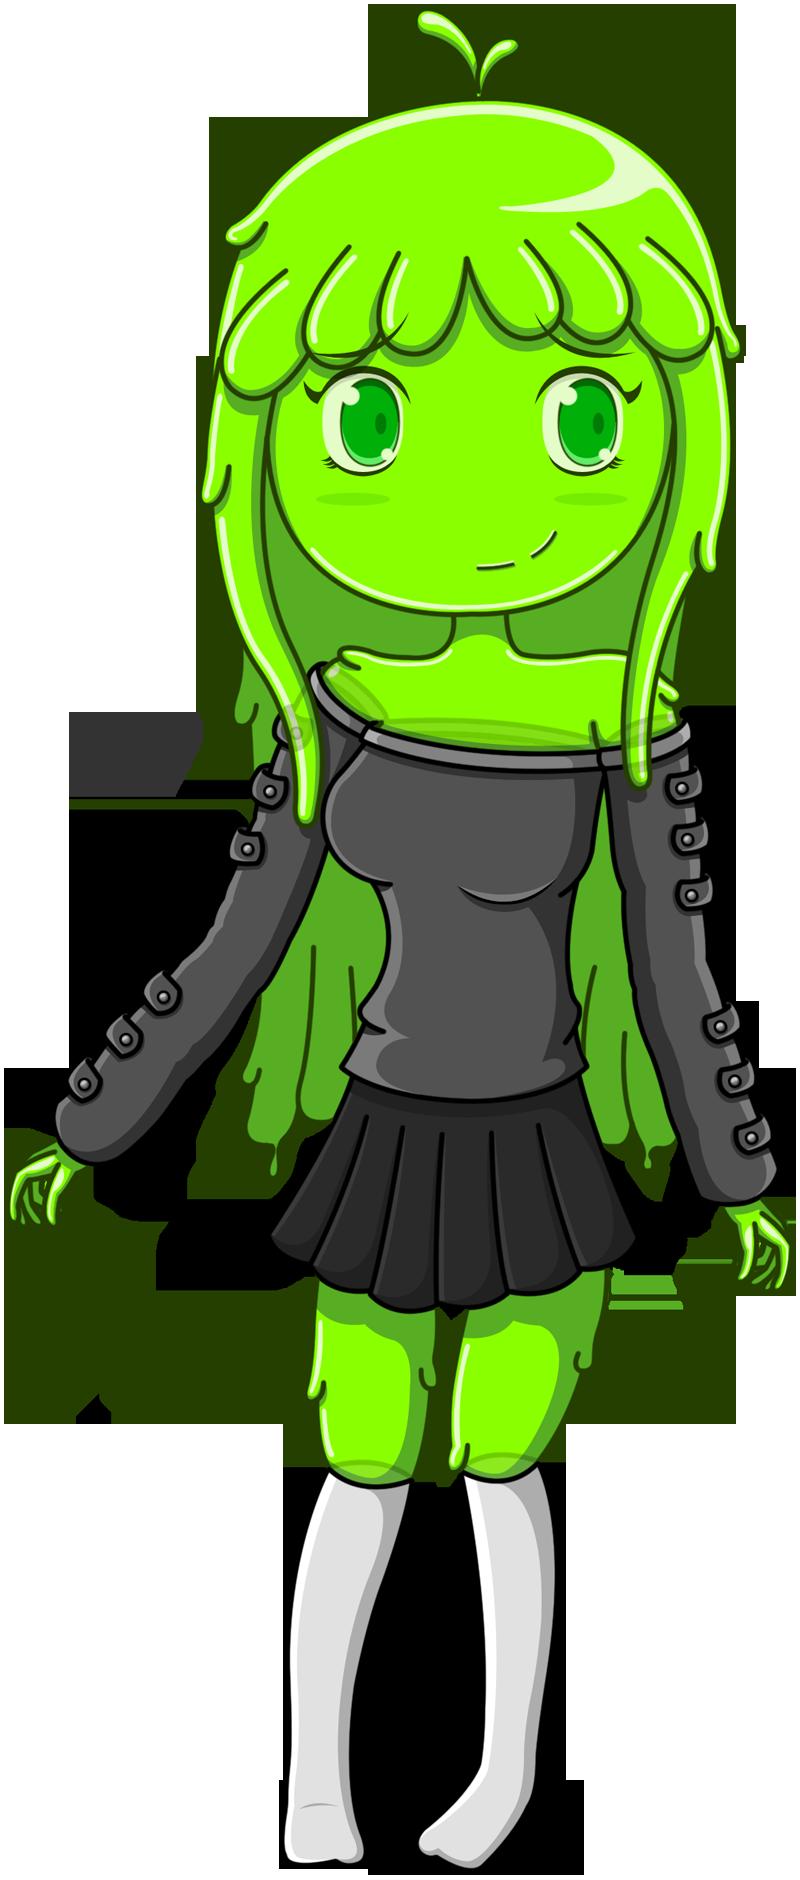 Slime Girl by JoTheWeirdo